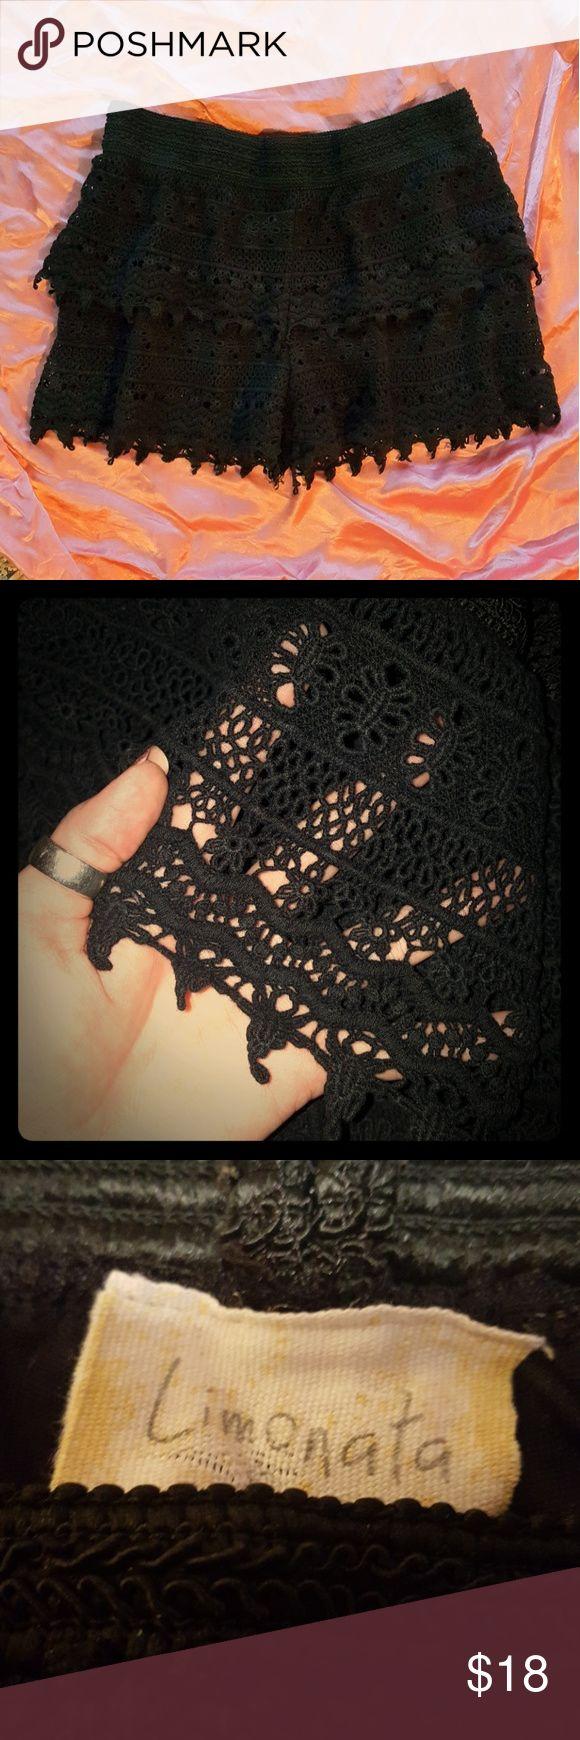 Limonata crochet shorts L Black crochet shorts with elastic waistband, barely worn they are like new. Limonata Shorts